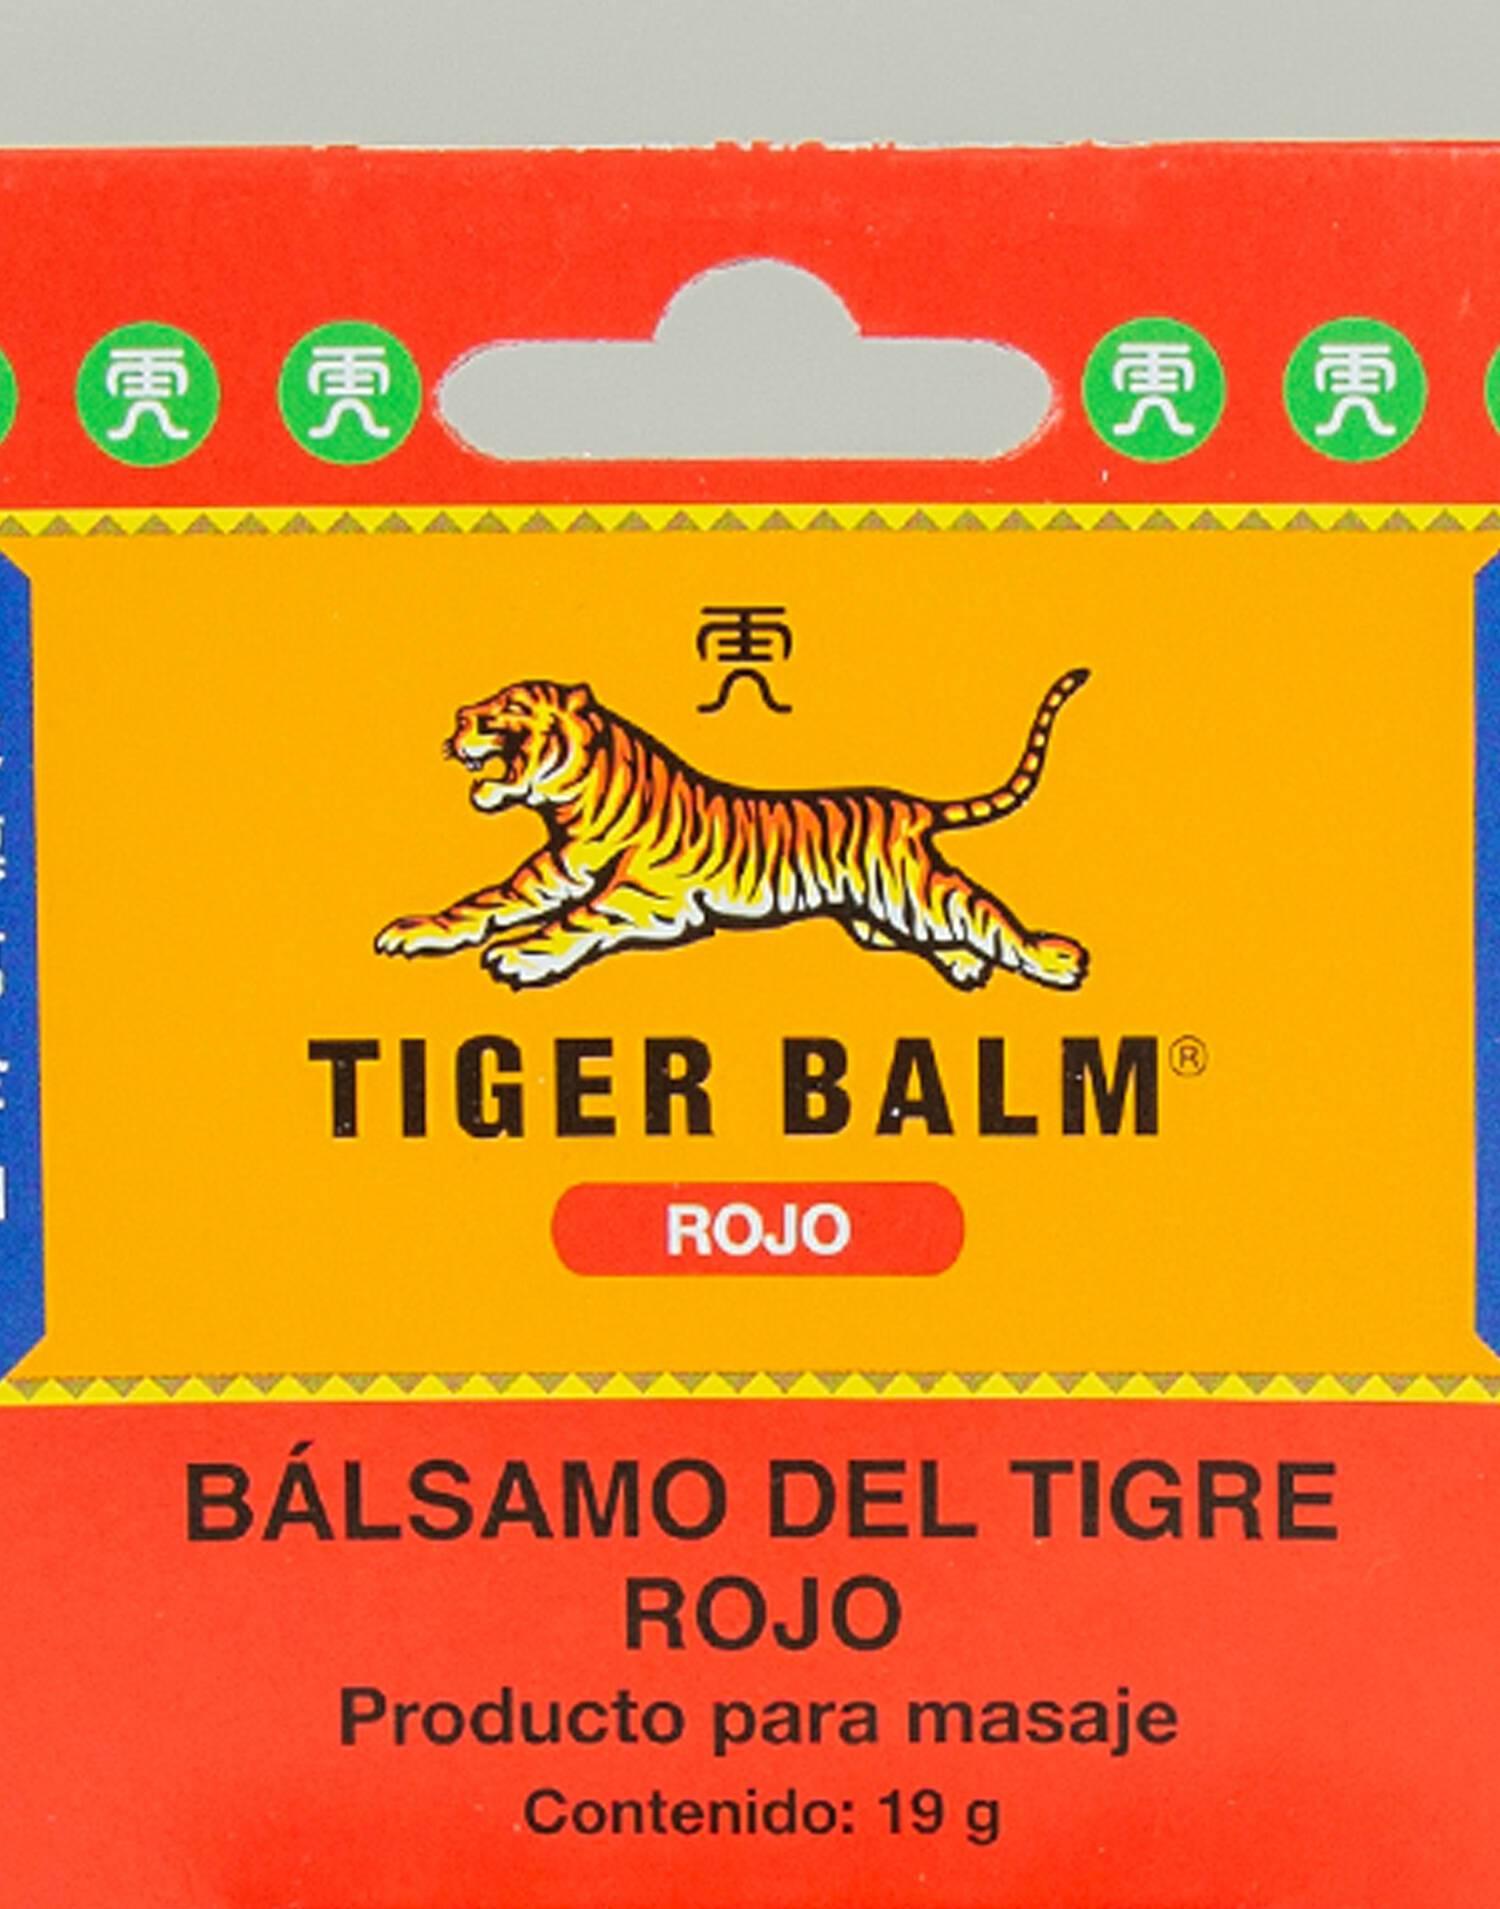 Red tiger balm